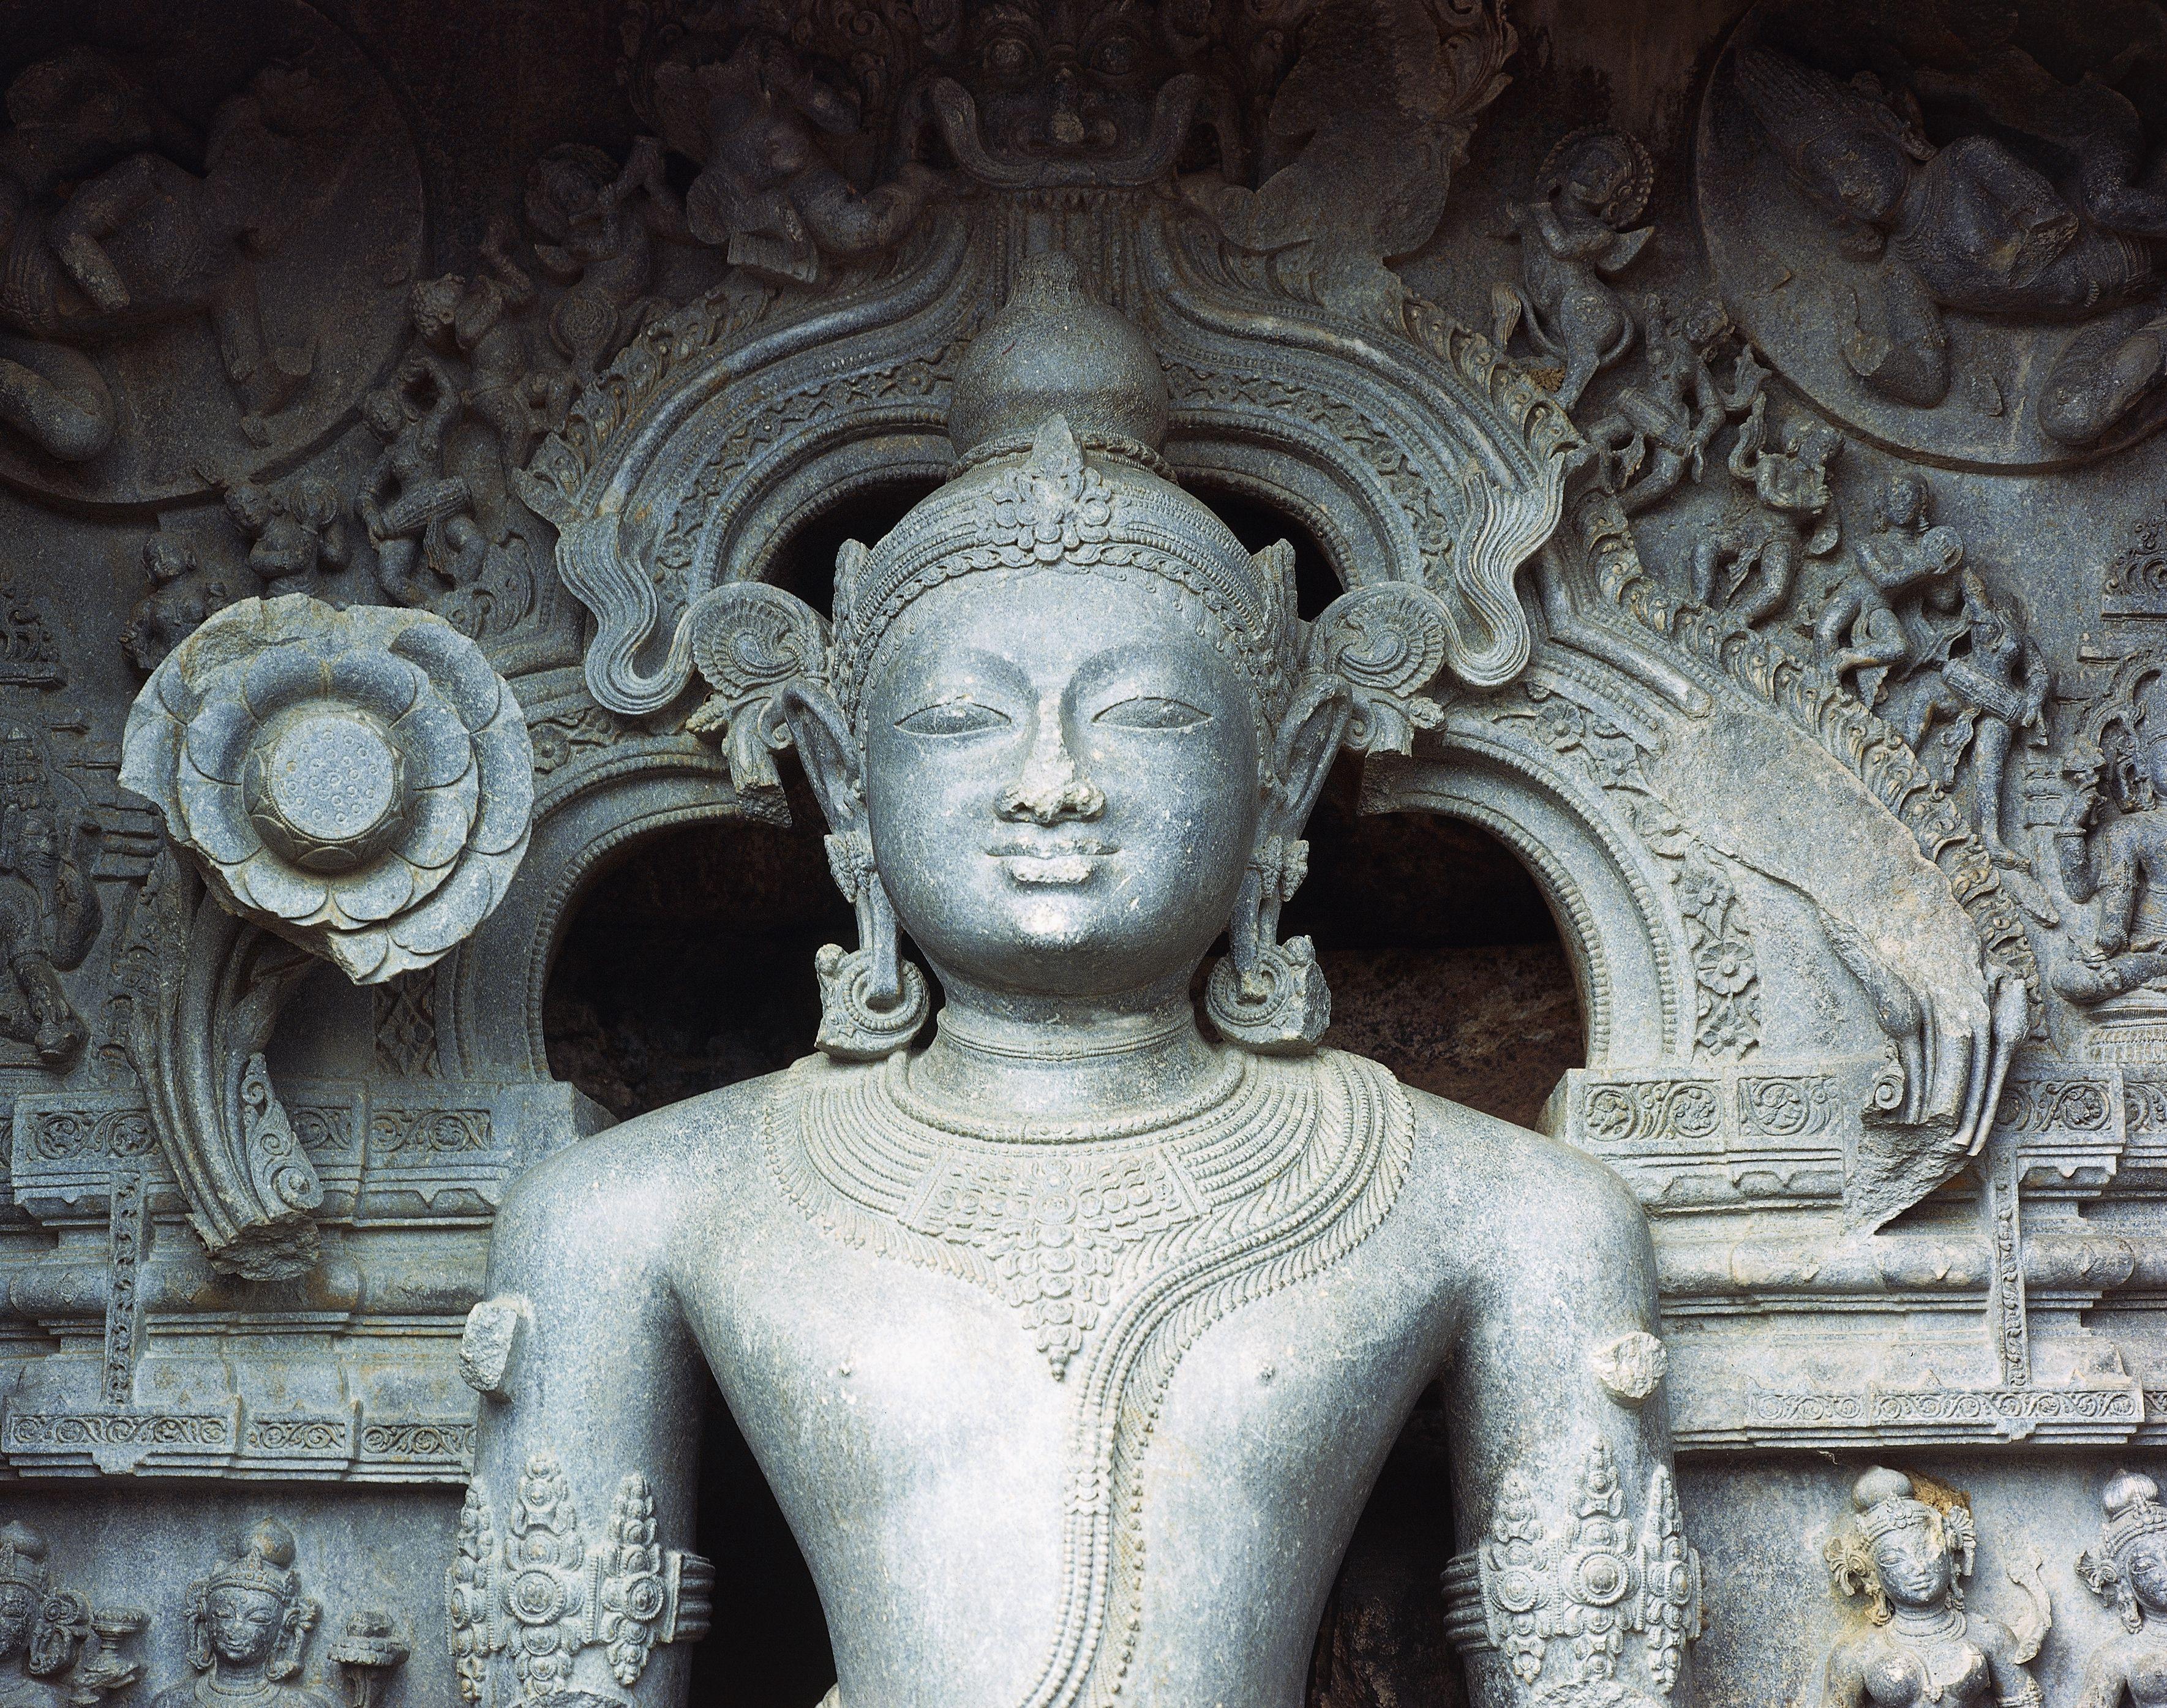 Statue of Sun God (Surya) in green stone, Konark Sun Temple (Surya), or Black Pagoda, built by Narasimhadeva of Gangaintorno Dynasty (1250), (Unesco World Heritage Site, 1984), Konarak, Orissa, India